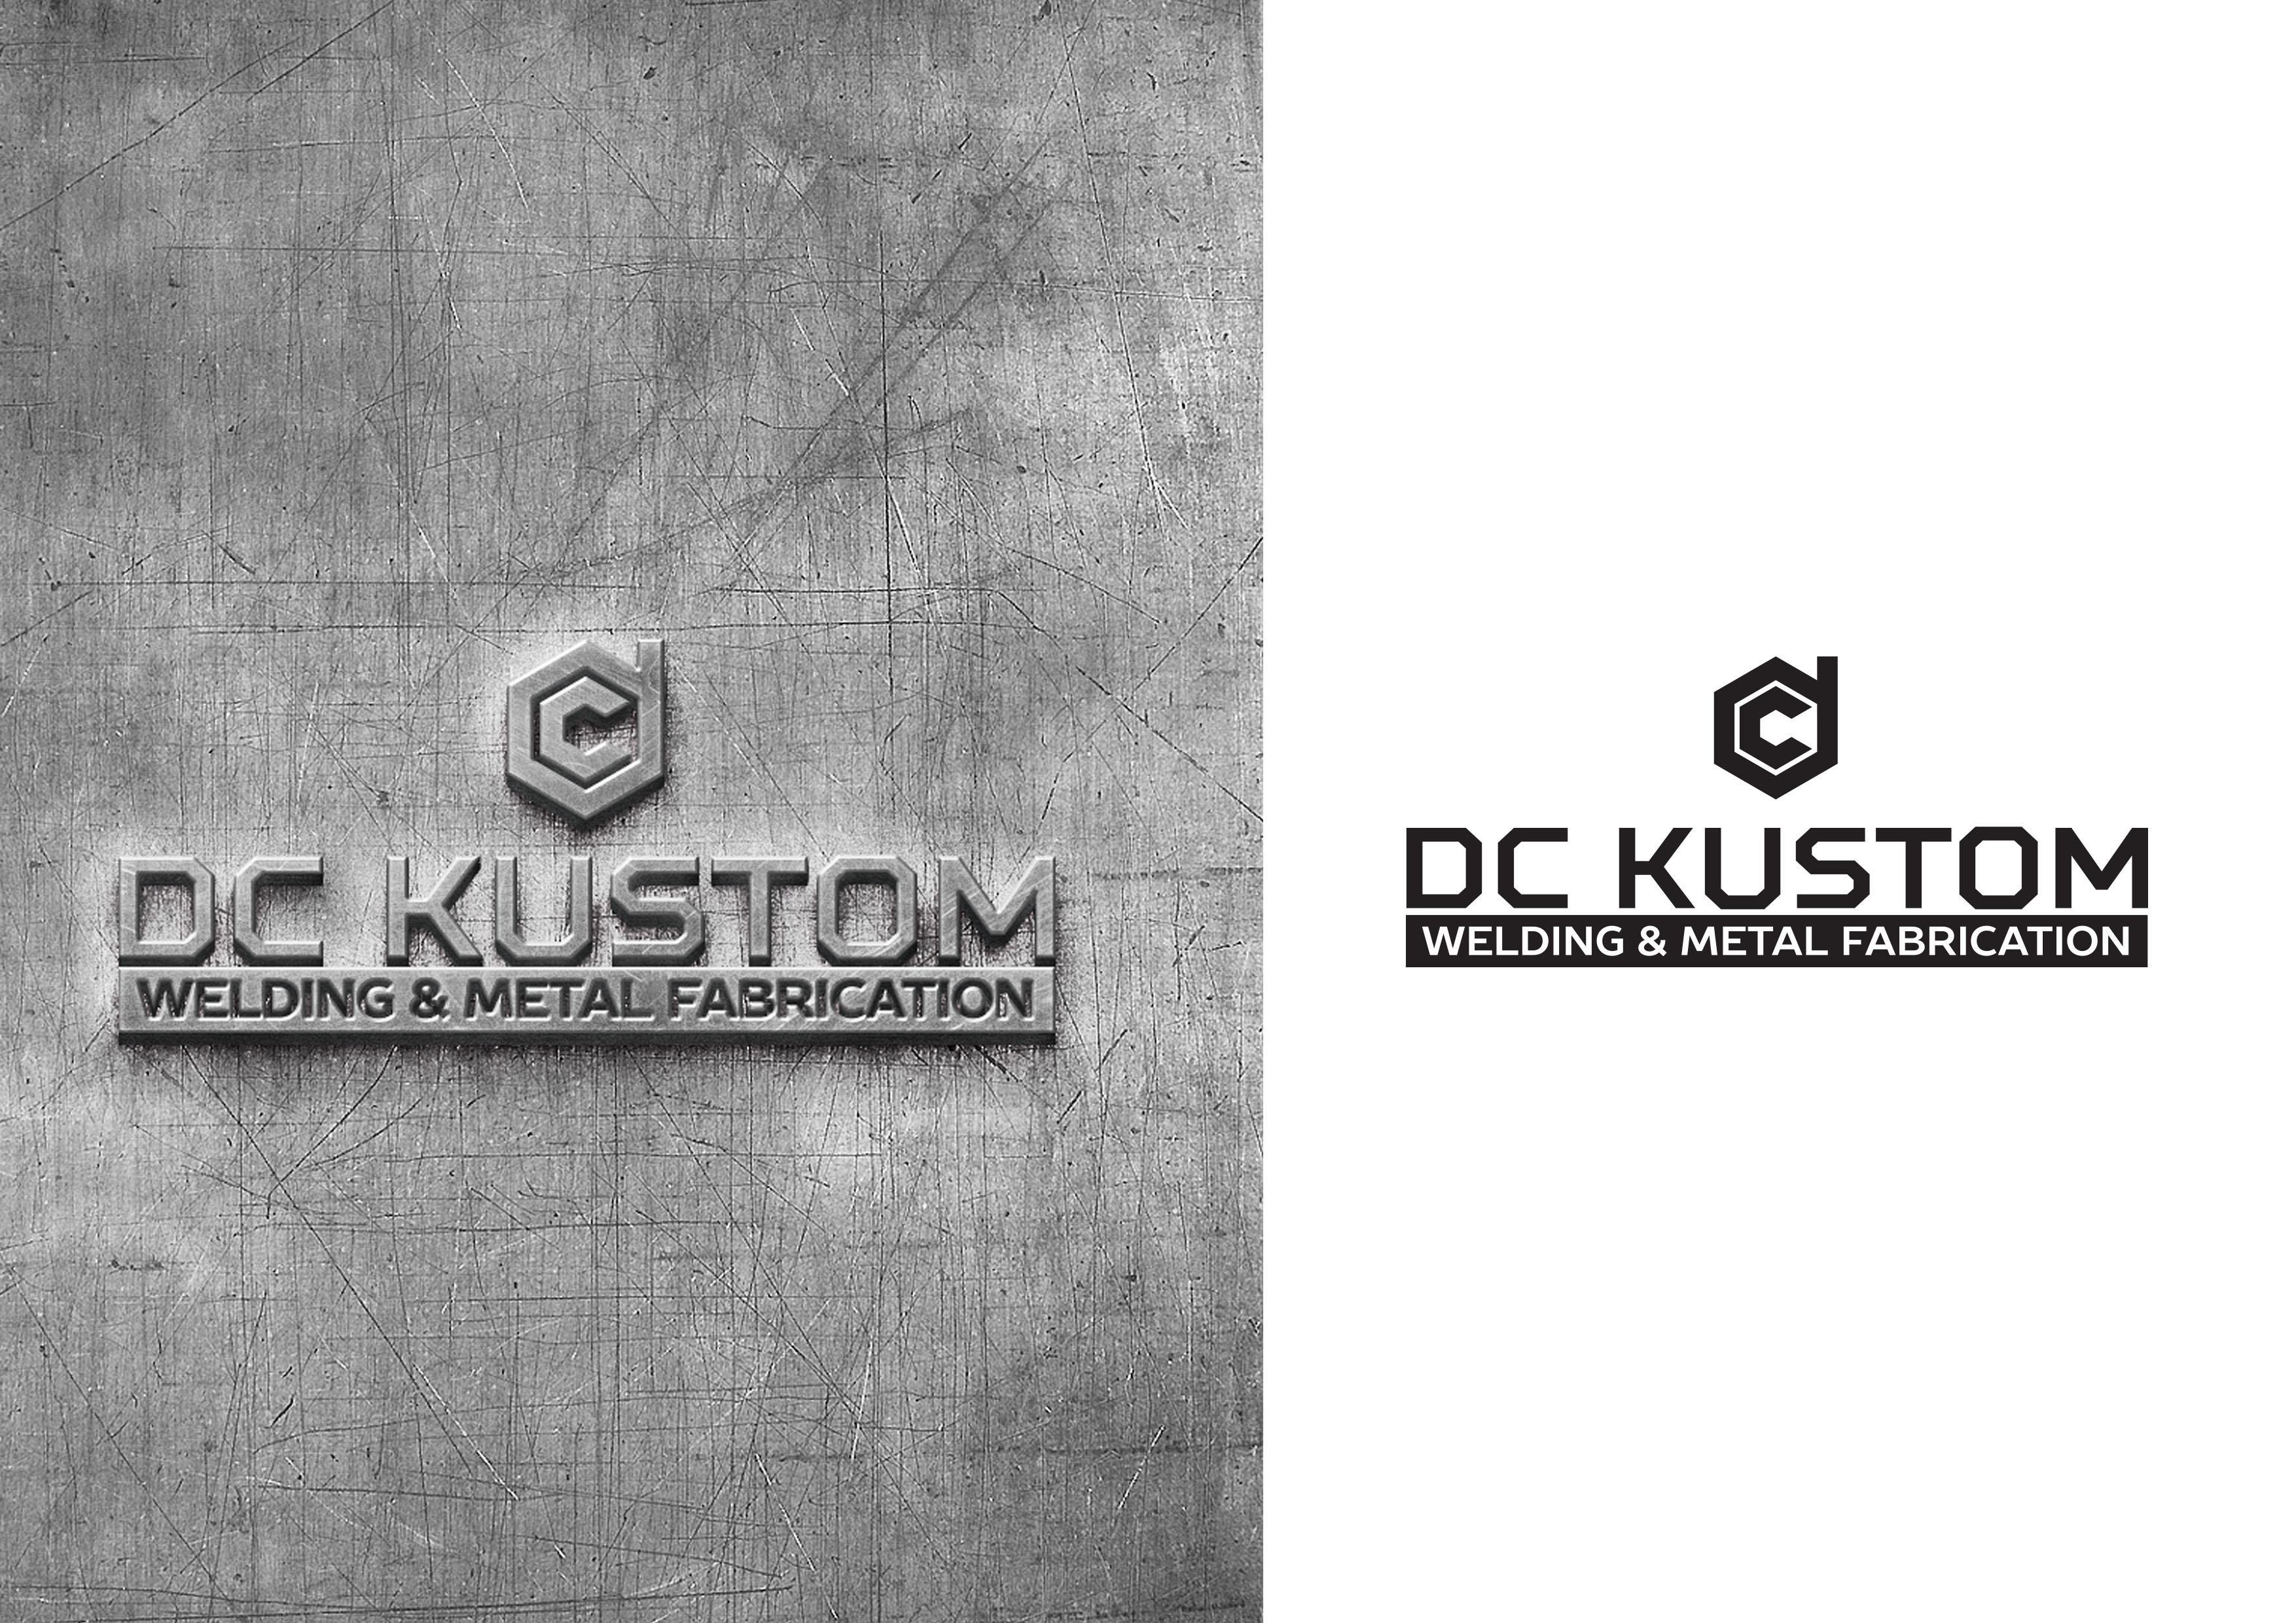 Logo Design by demang - Entry No. 141 in the Logo Design Contest Imaginative Logo Design for DC KUSTOM WELDING & METAL FABRICATION.